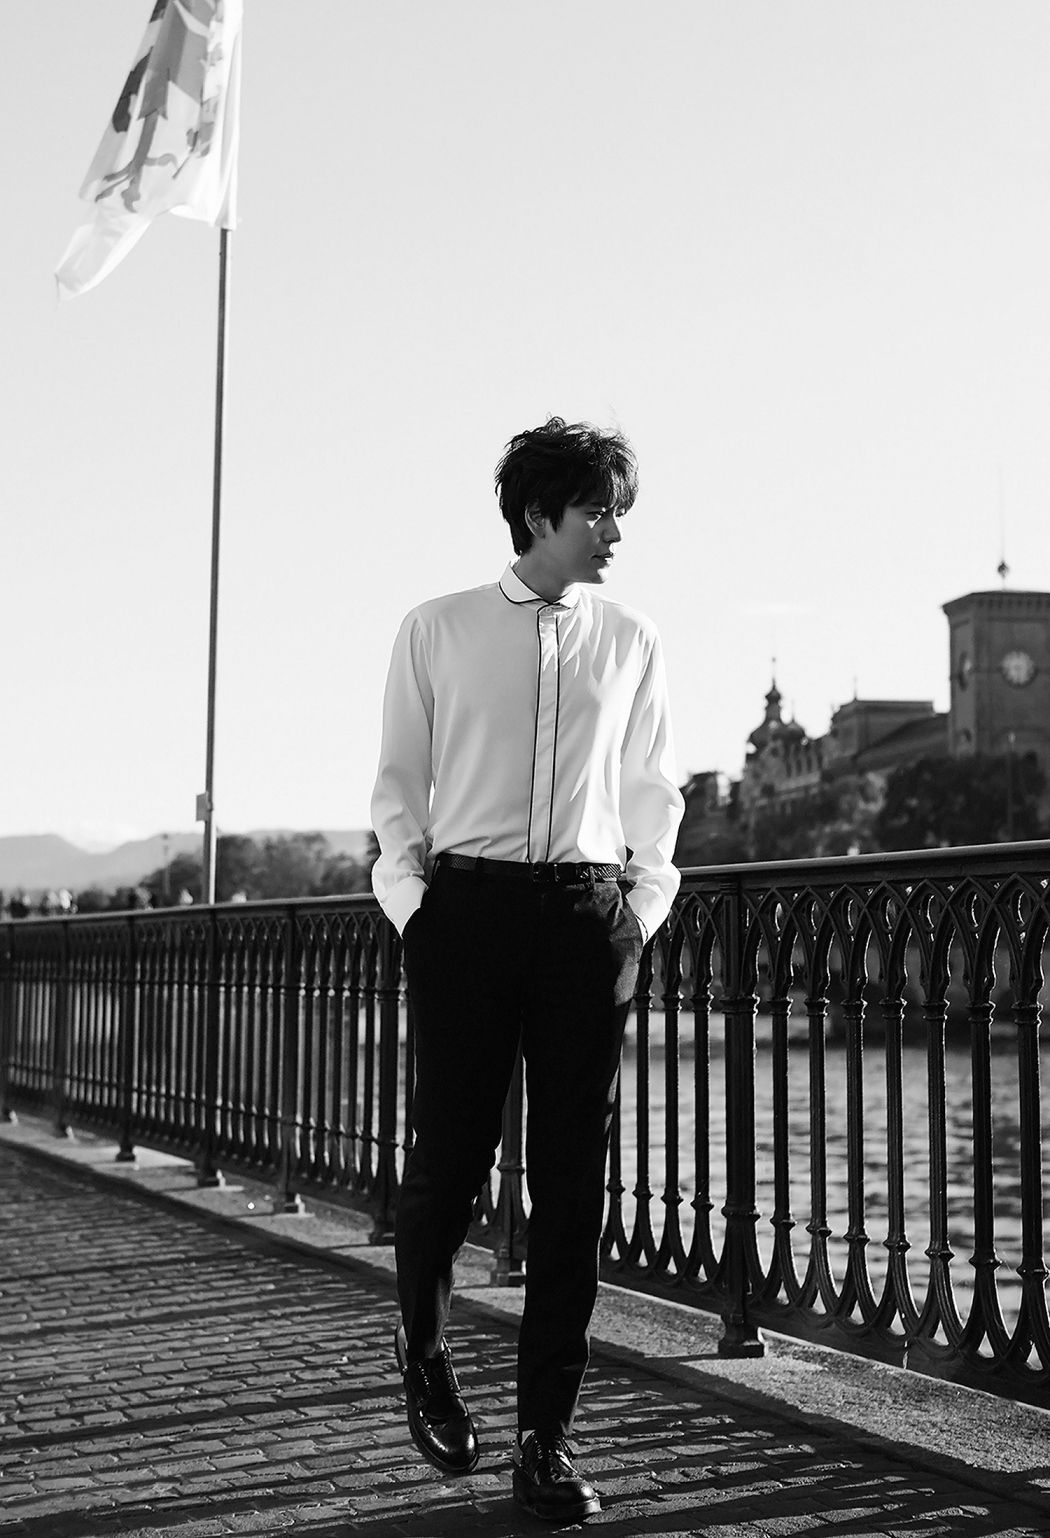 Kyu Hyun - Fall, Once Again